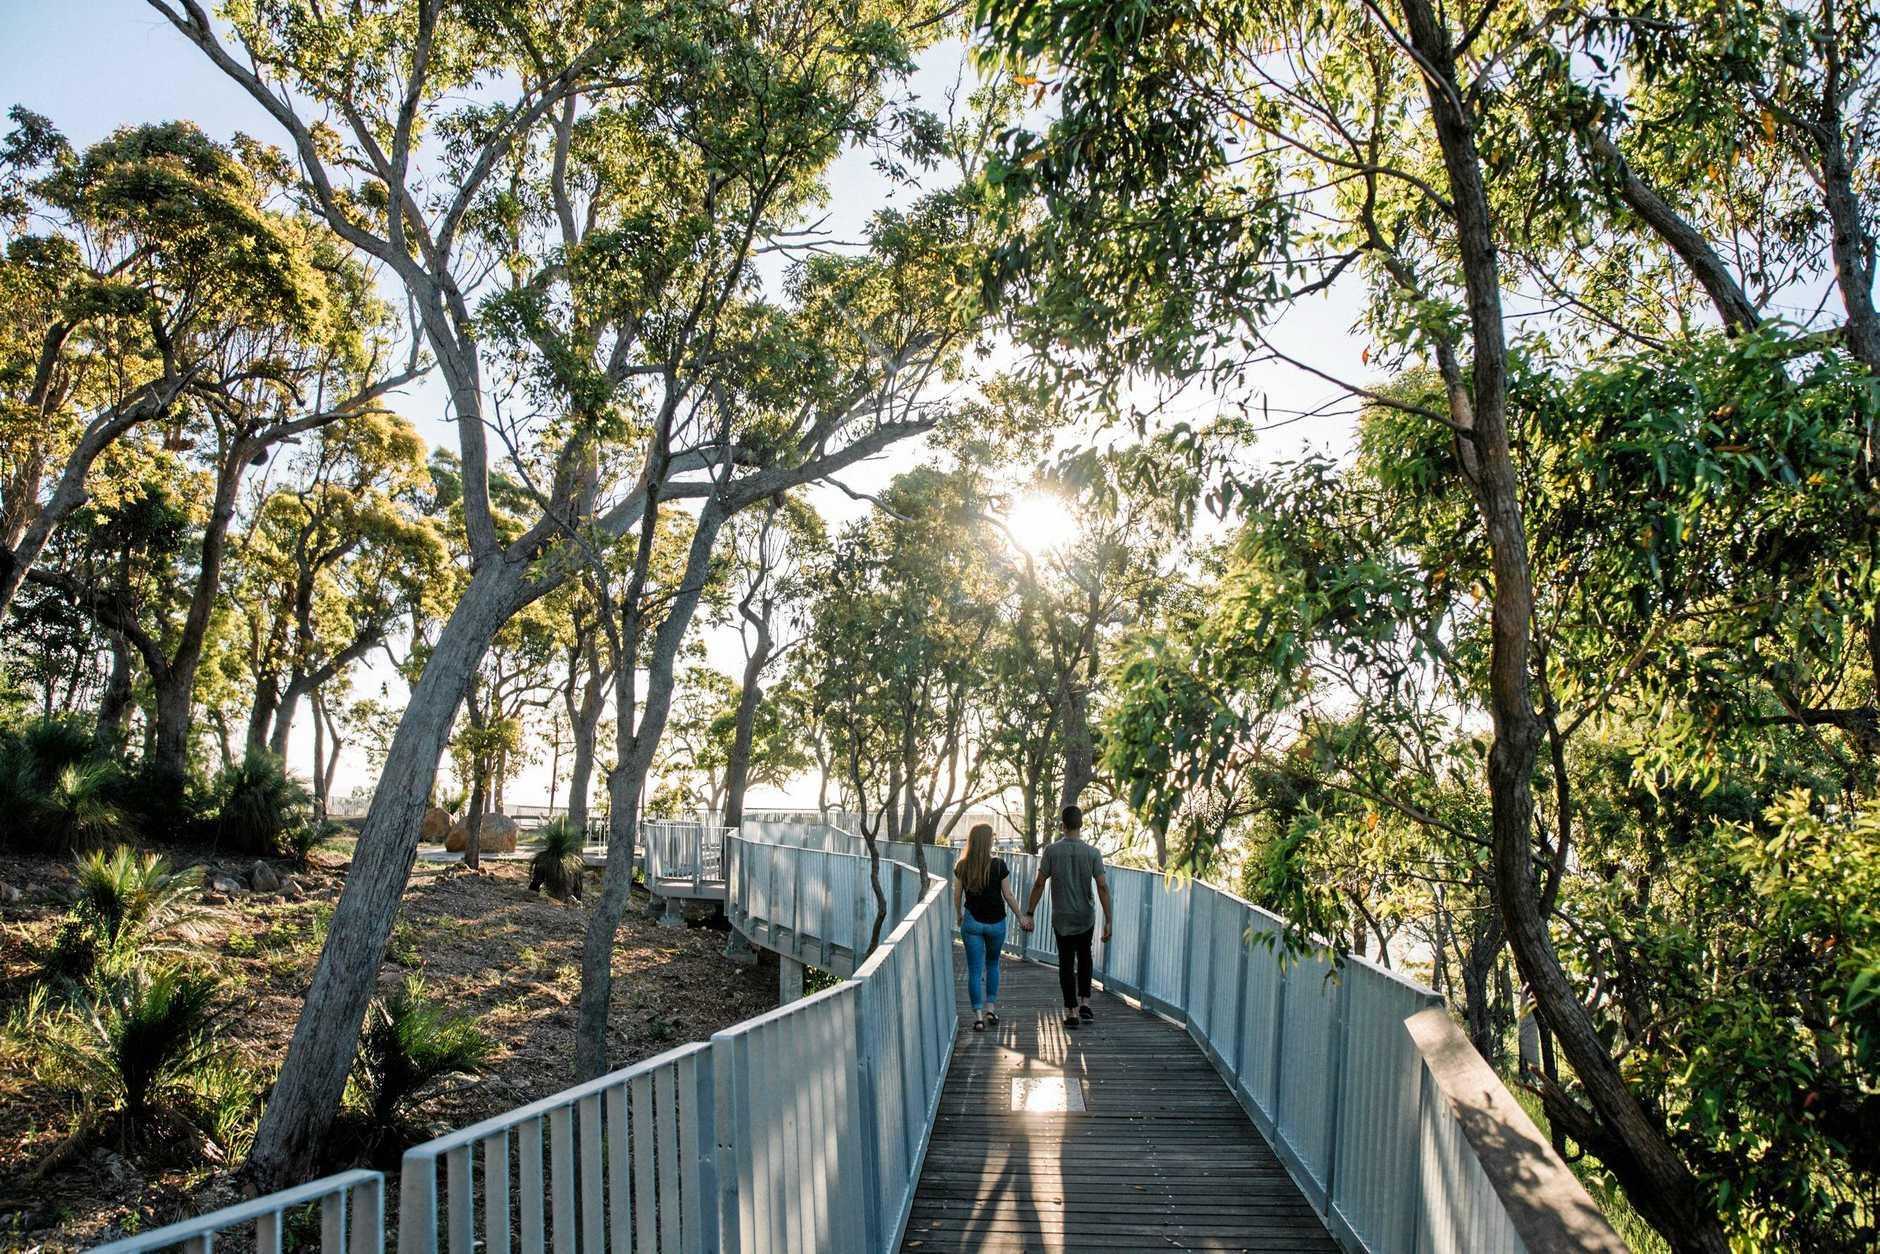 Nurim Circuit boardwalk on Mt Archer has made the shortlist int eh Australian National Timber Awards.